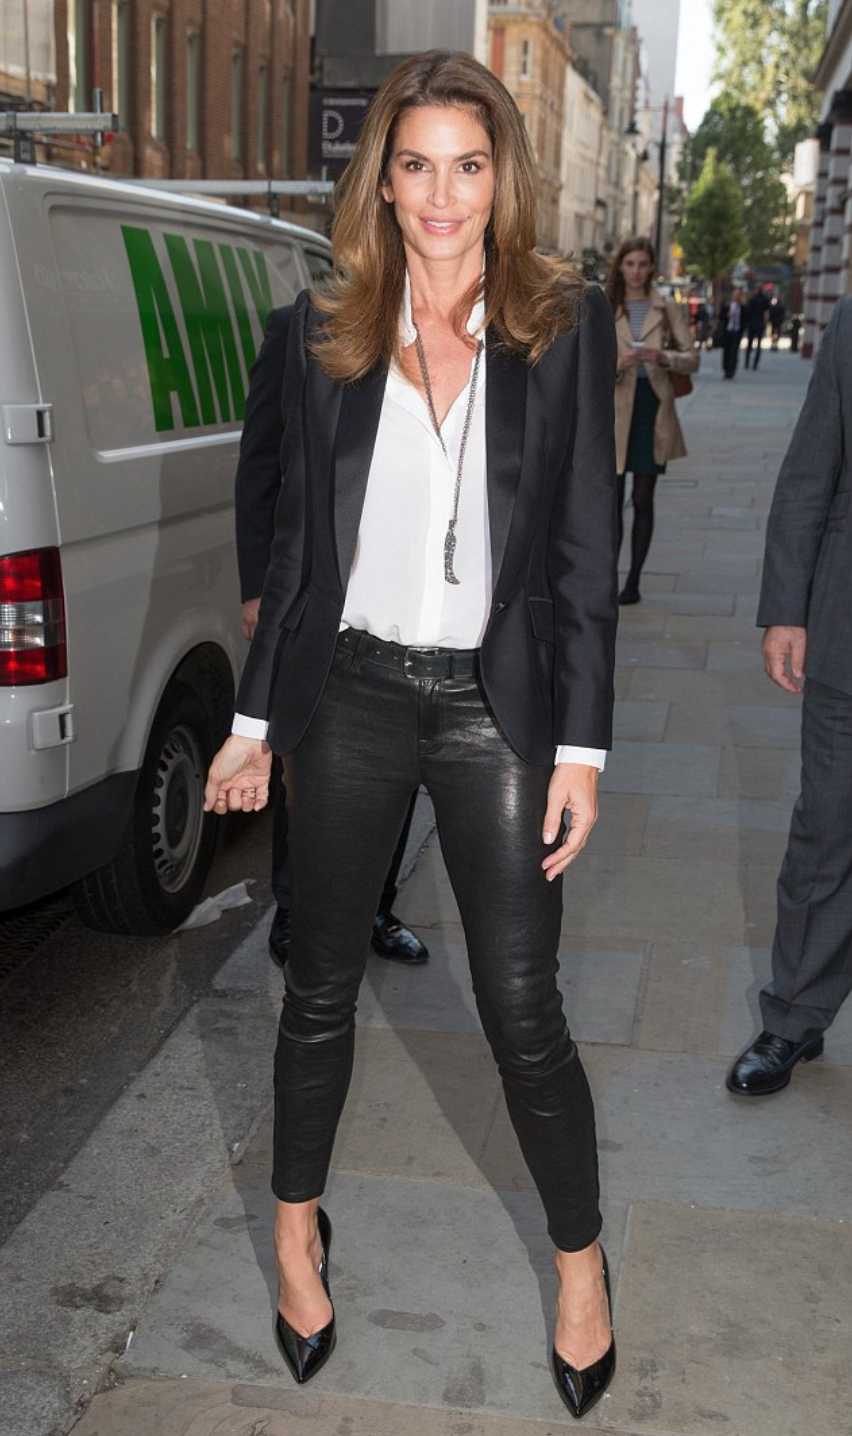 6a444092996b8 Cindy Crawford in her J BRAND L8001 Leather Super Skinny in Noir ...